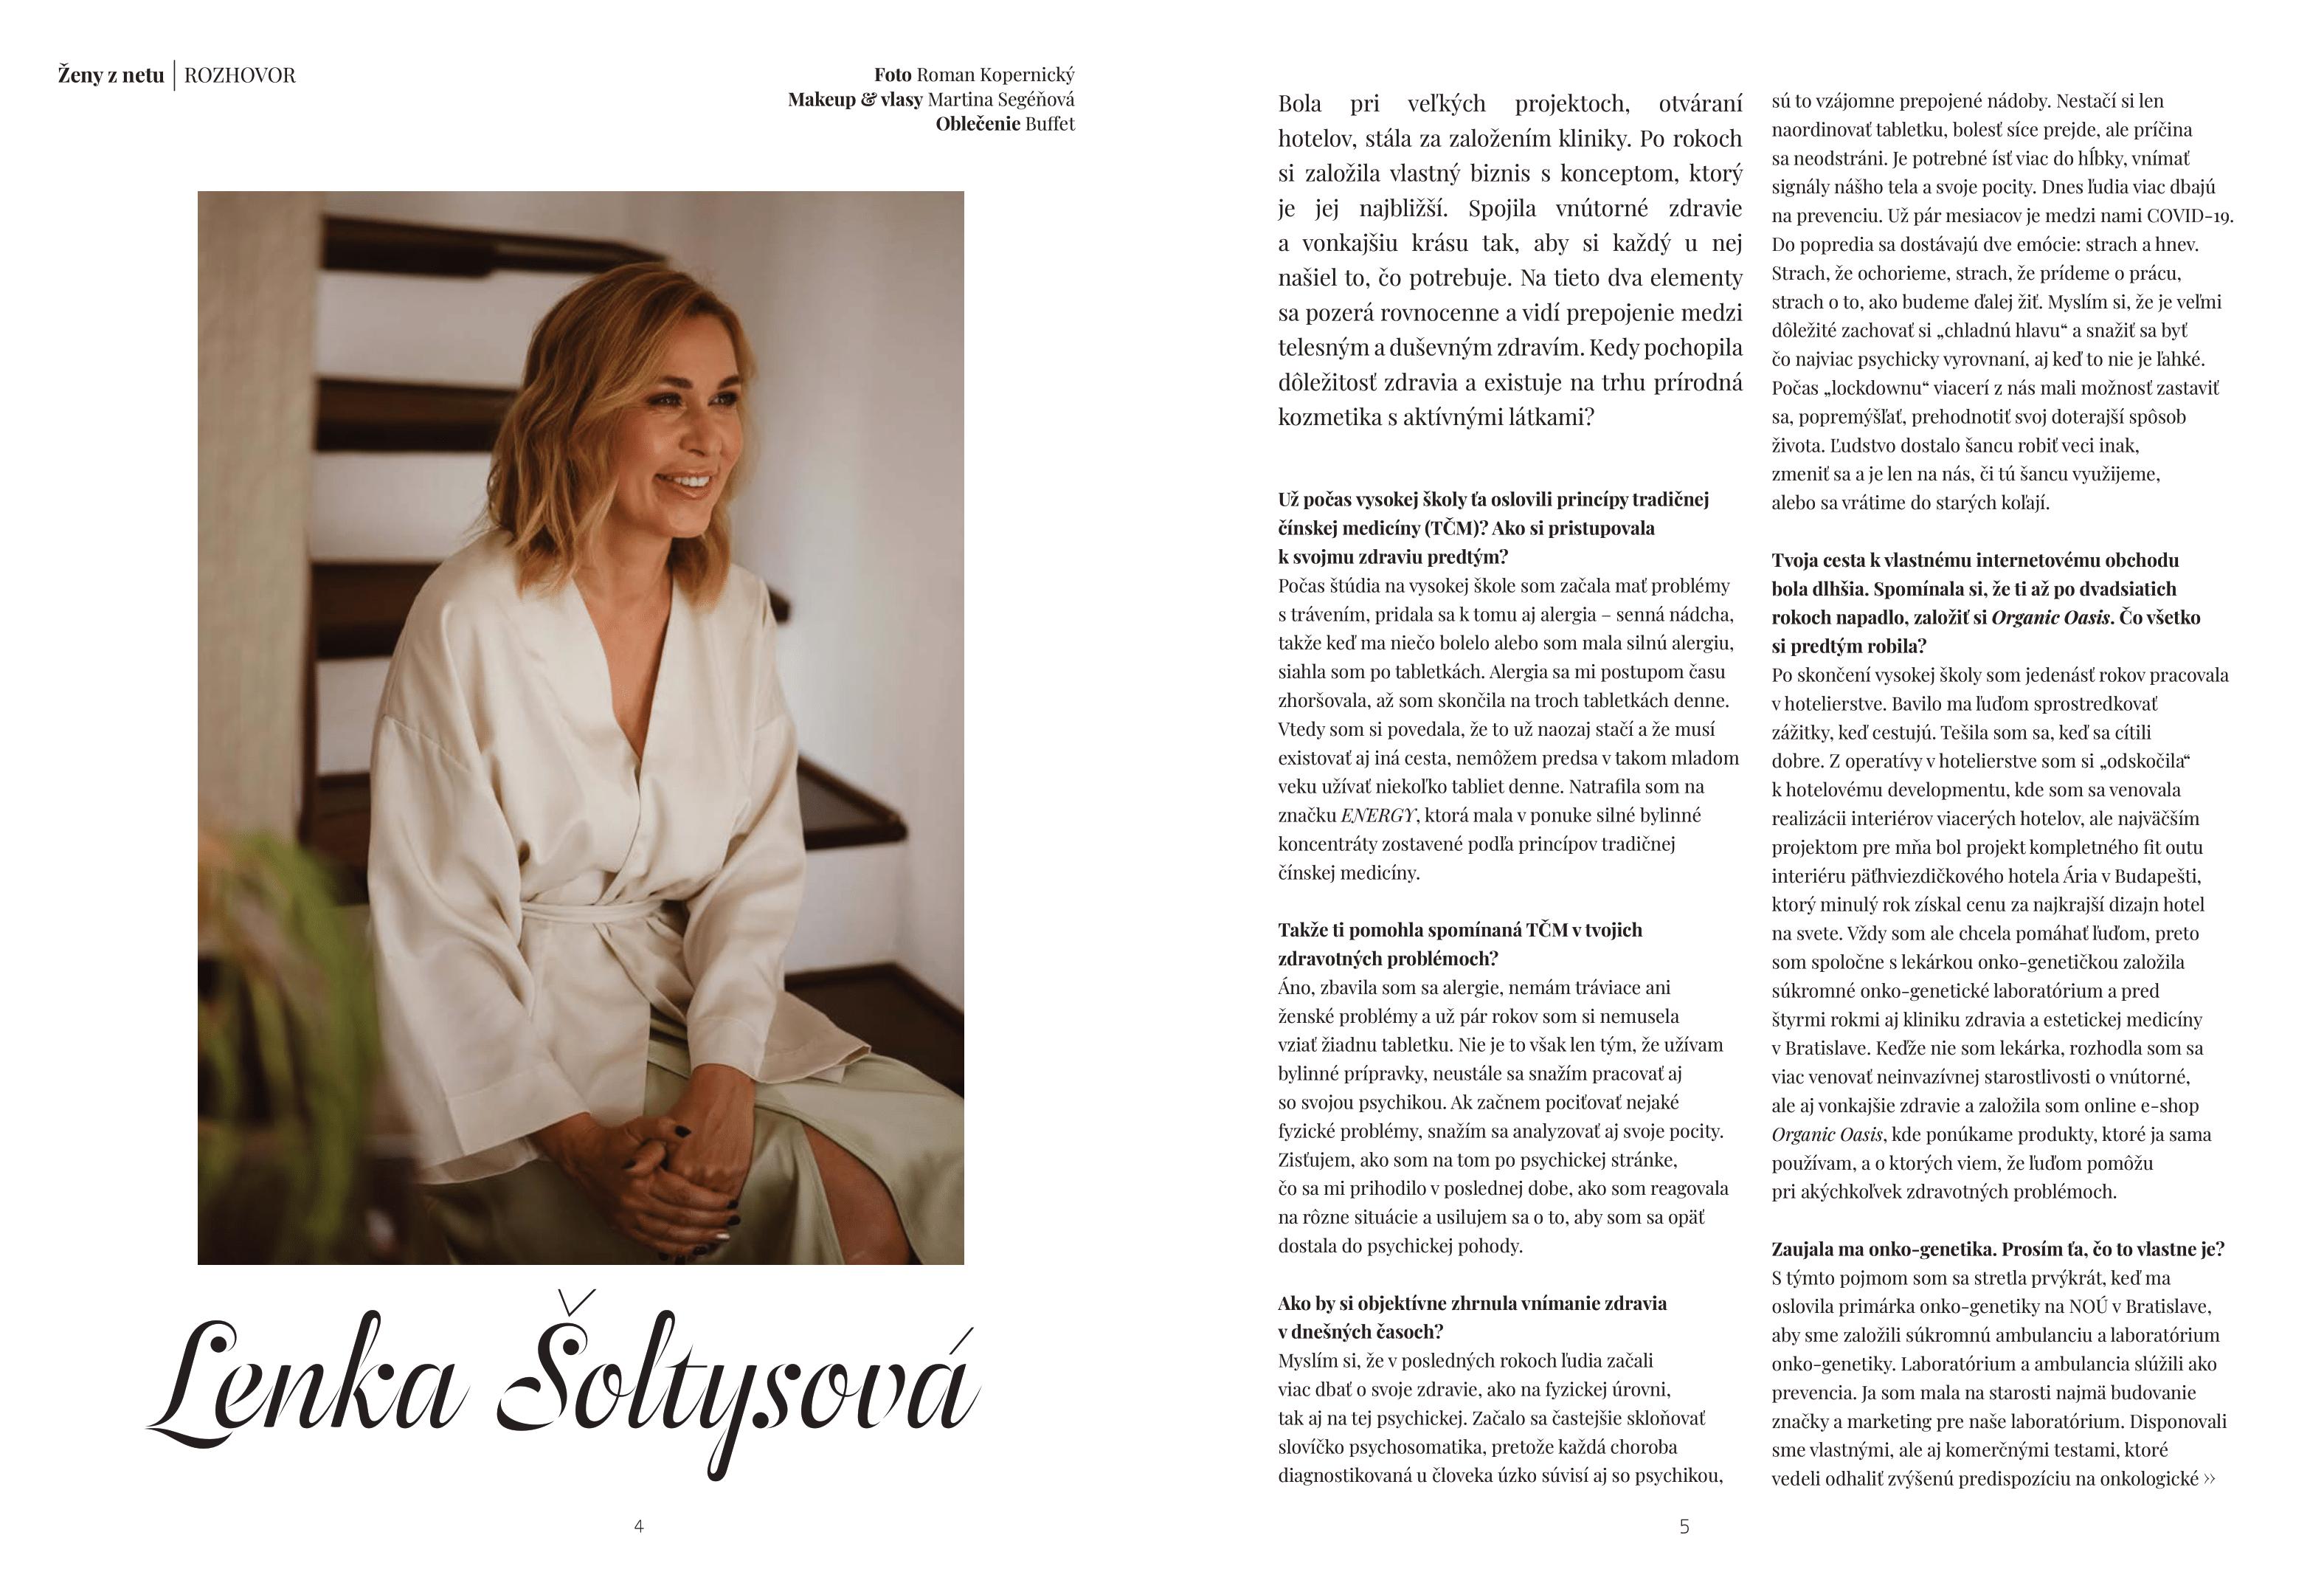 Ženy z Netu - Interview so zakladateľkou Organic Oasis Lenkou Šoltysovou